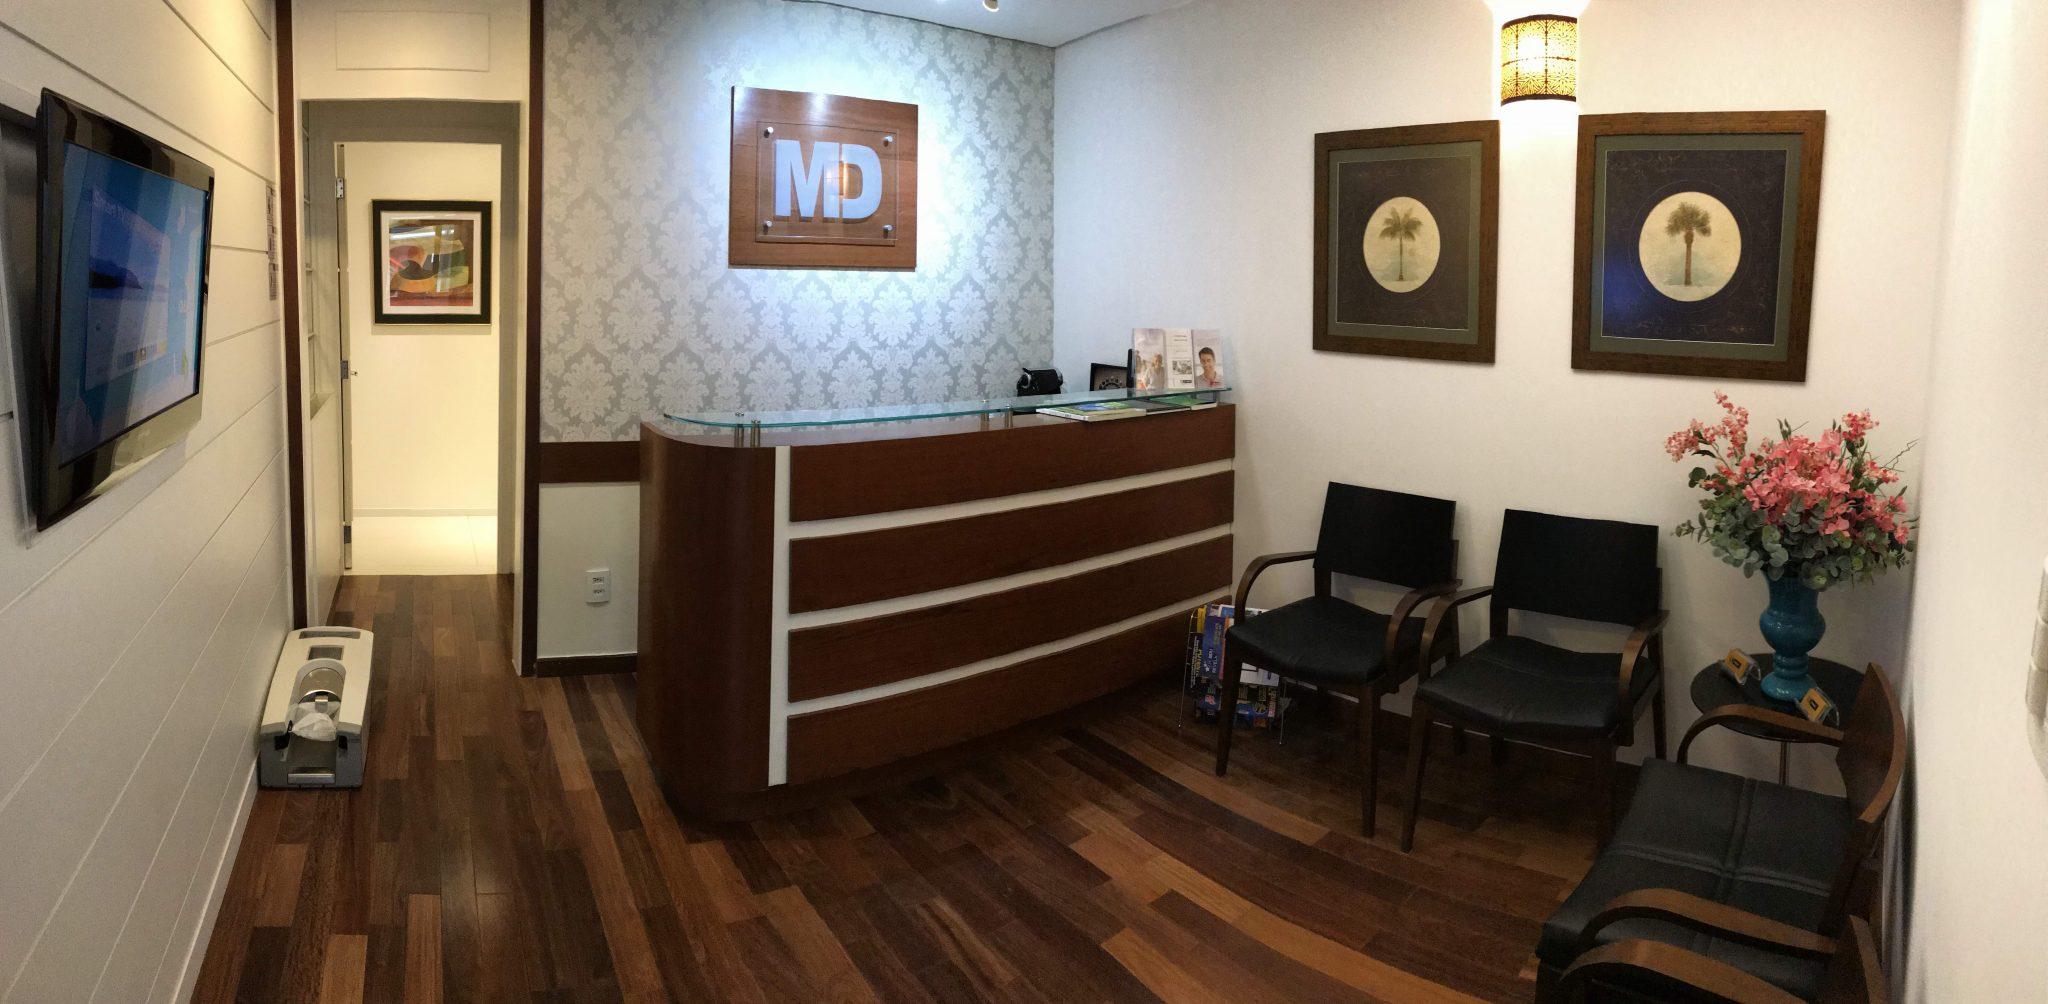 Dentista-na-barra-da-tijuca